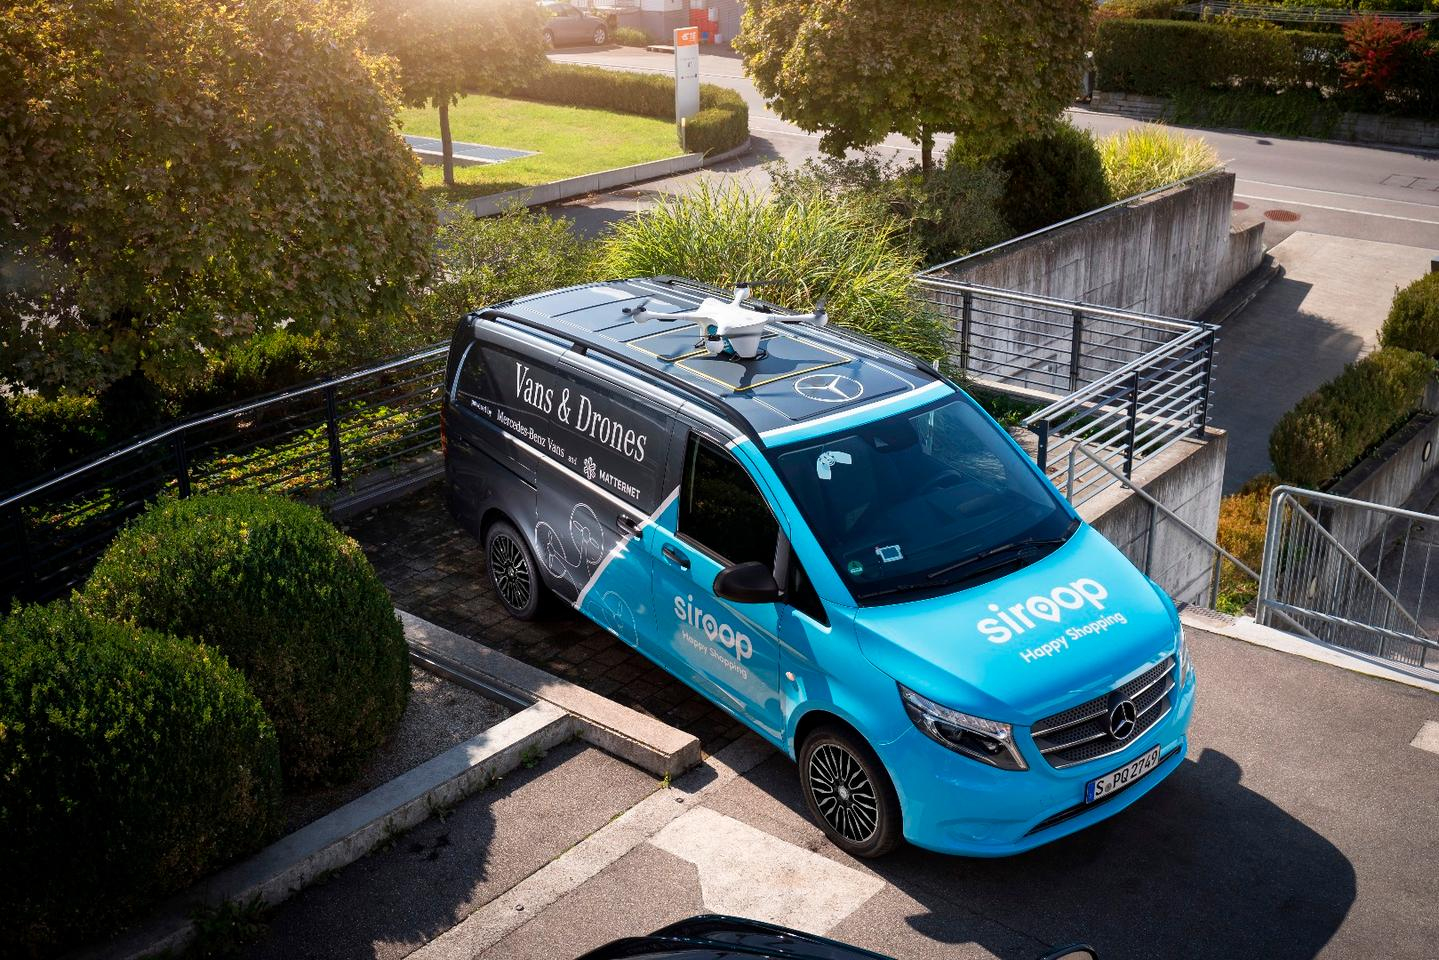 Mercedes kicked off trials of its drone-van delivery service last week